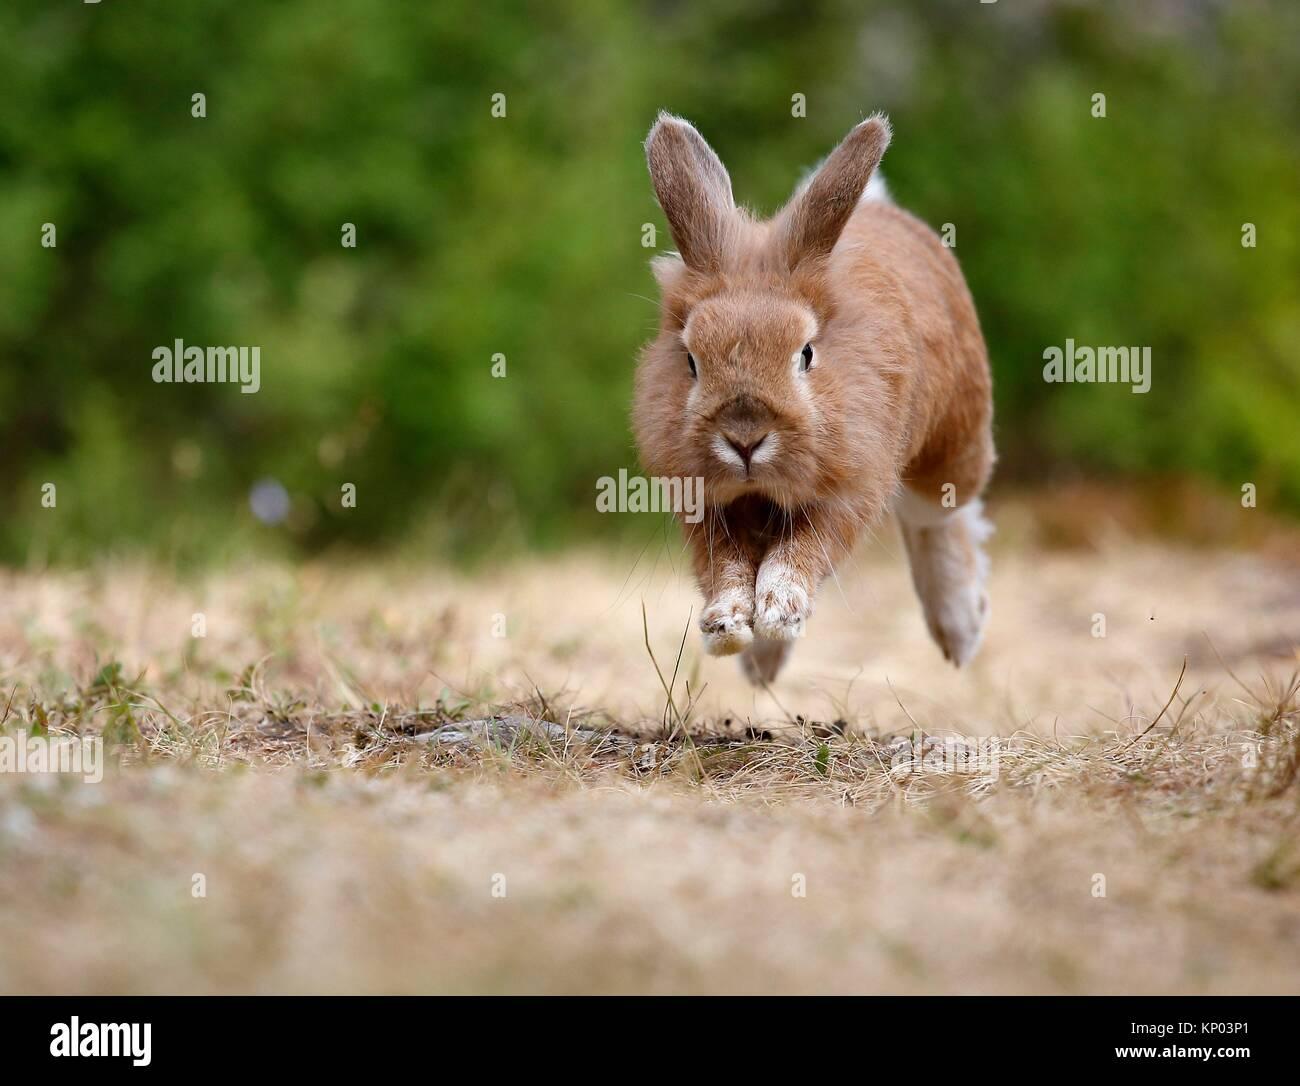 Running Rabbit - Stock Image